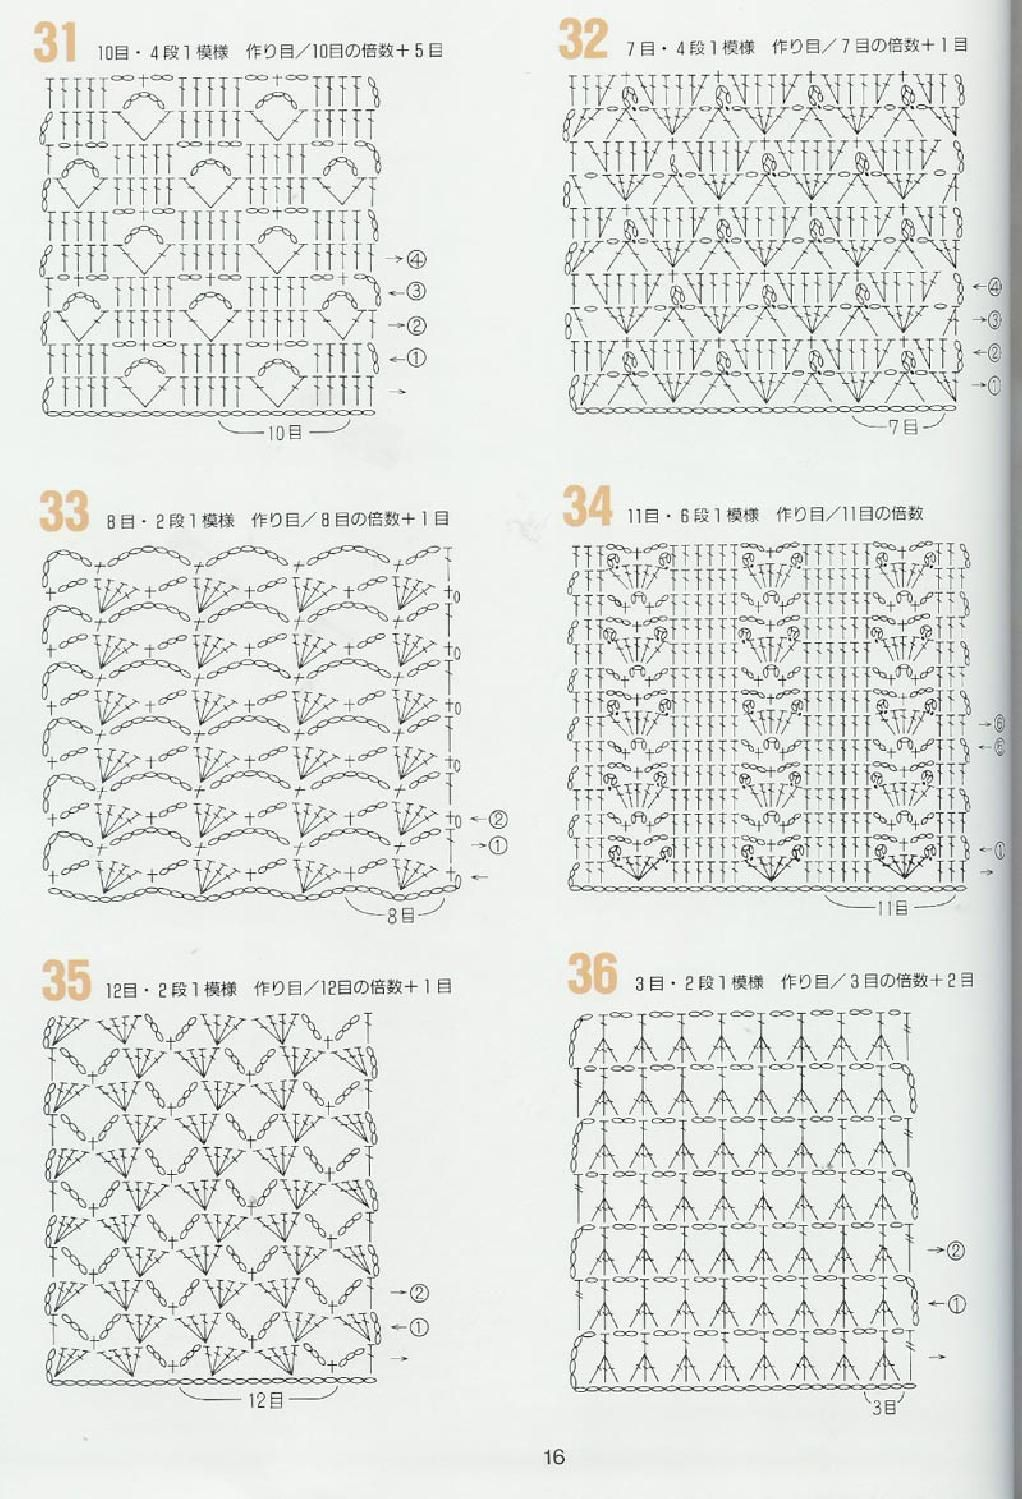 262 patrones crochet | crochet stiches | Pinterest | Patrones ...